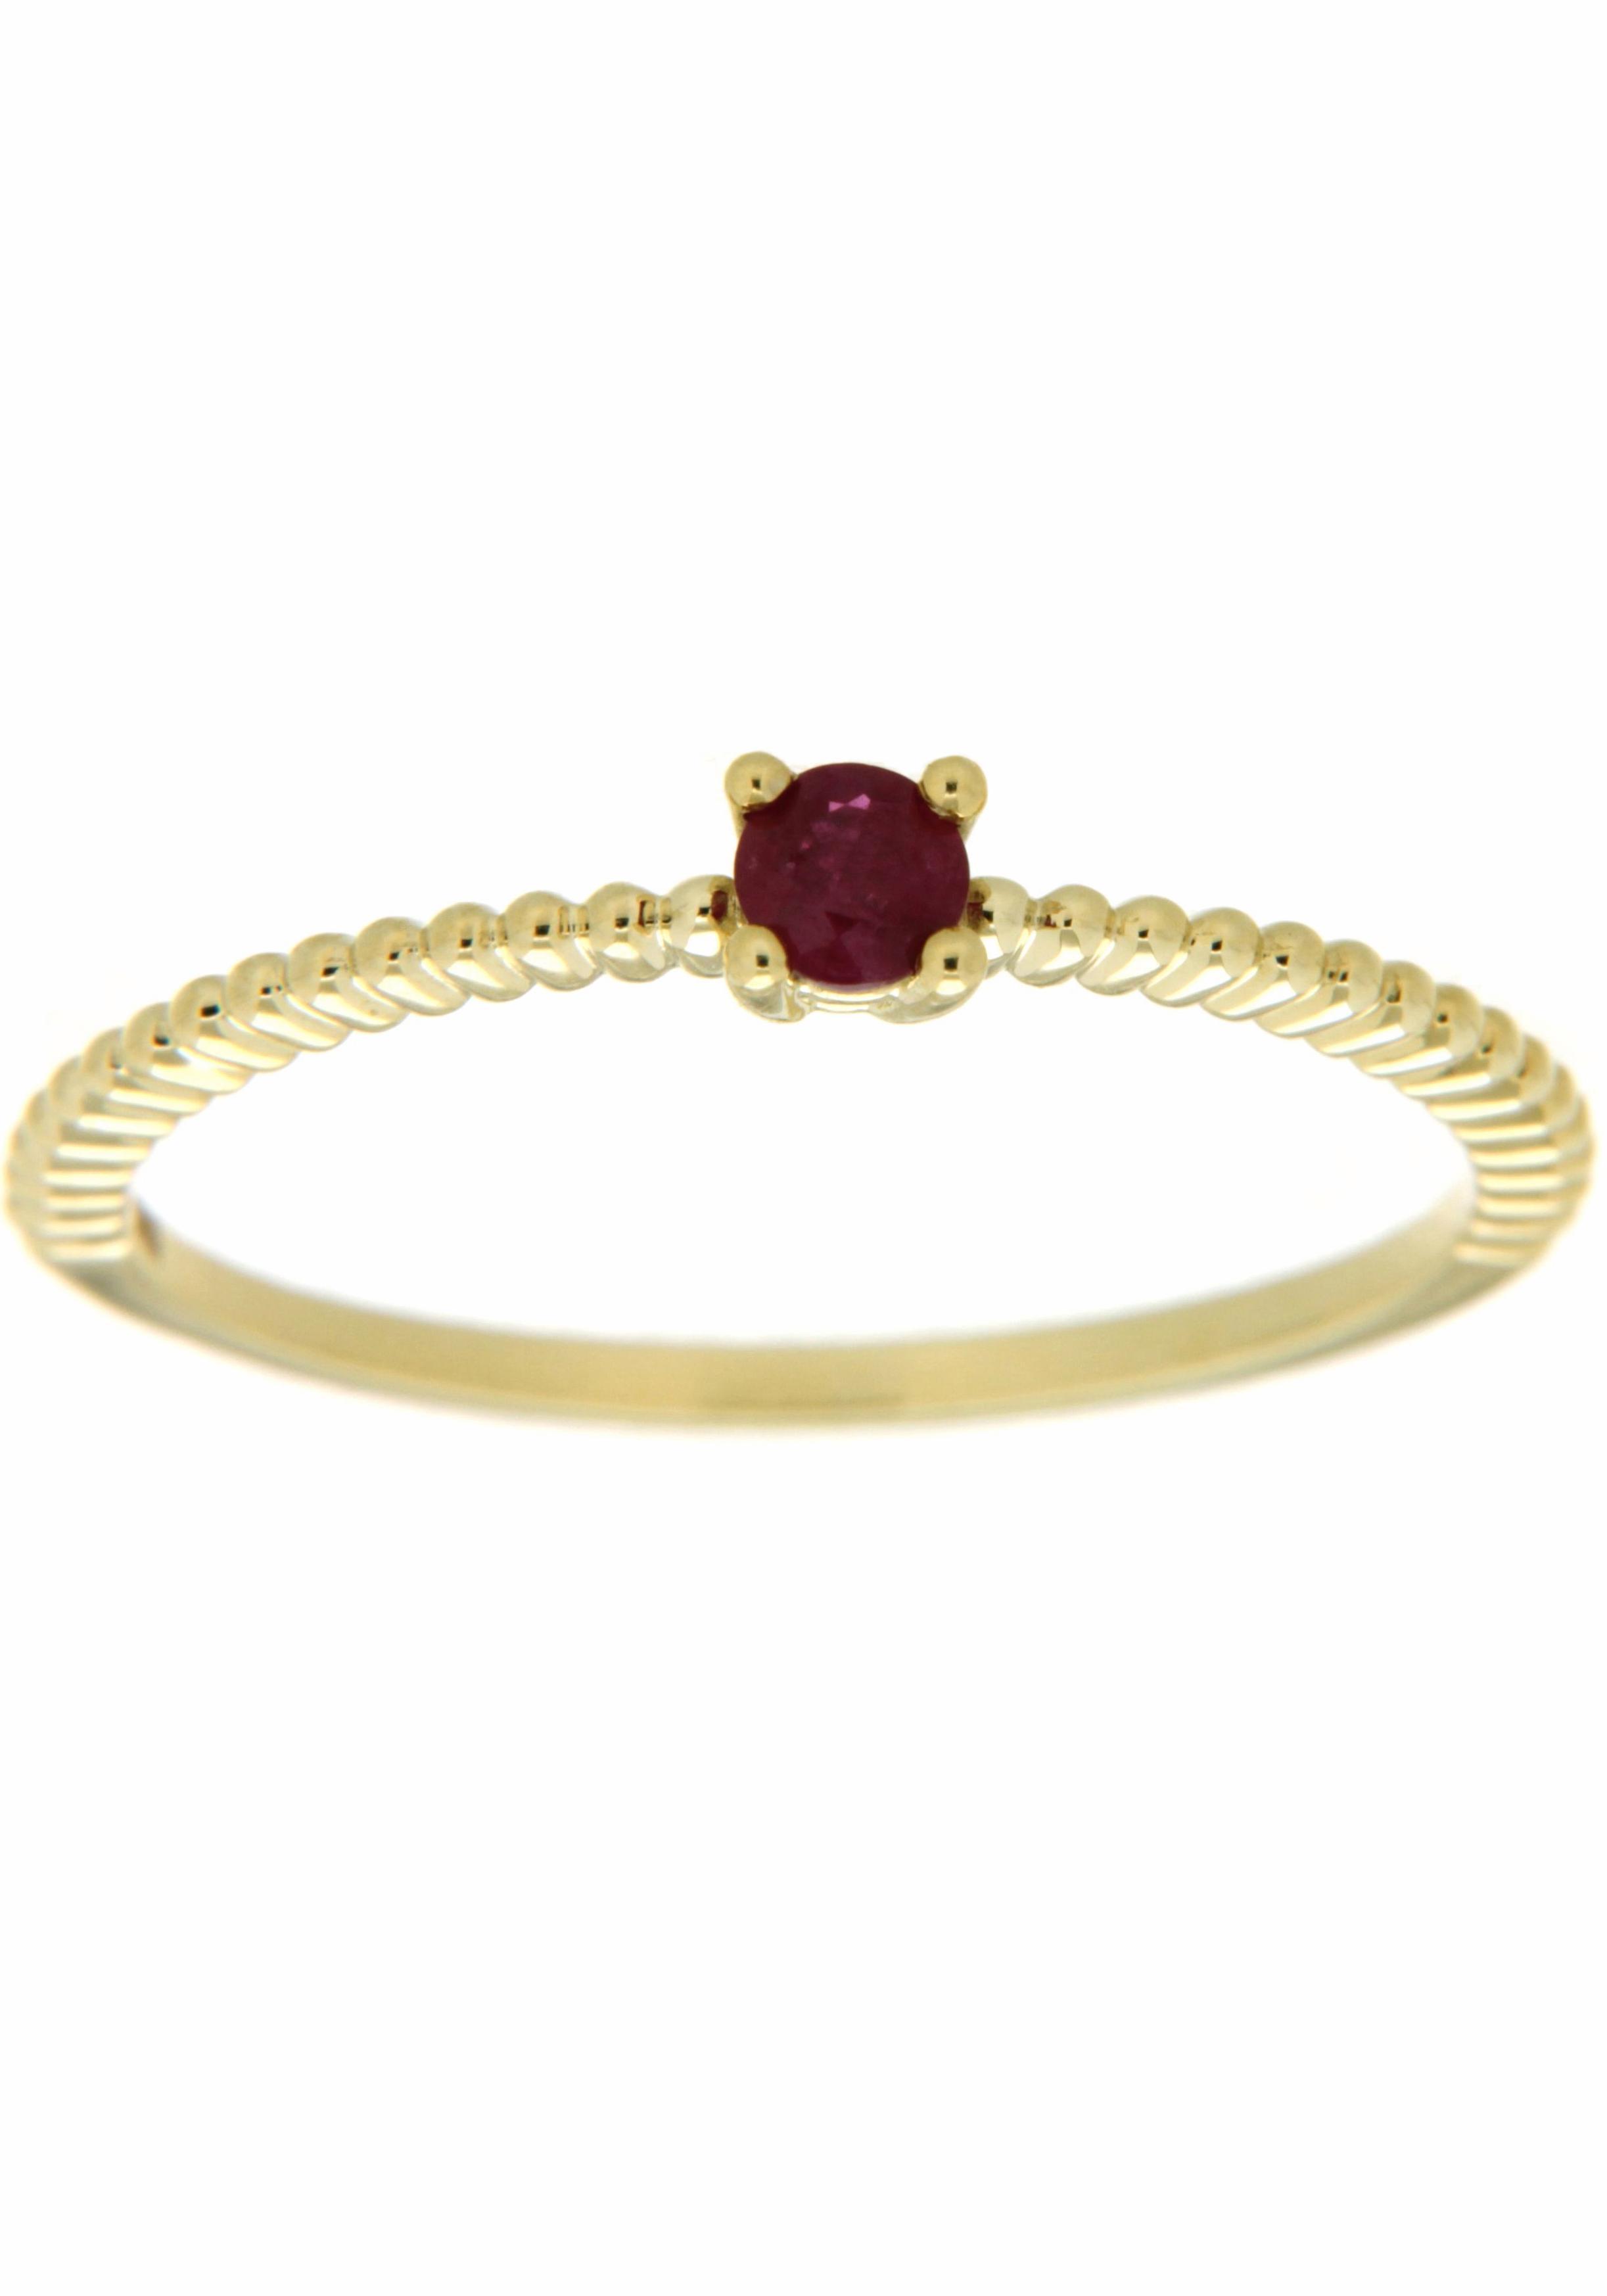 Vivance jewels Goldring Preisvergleich